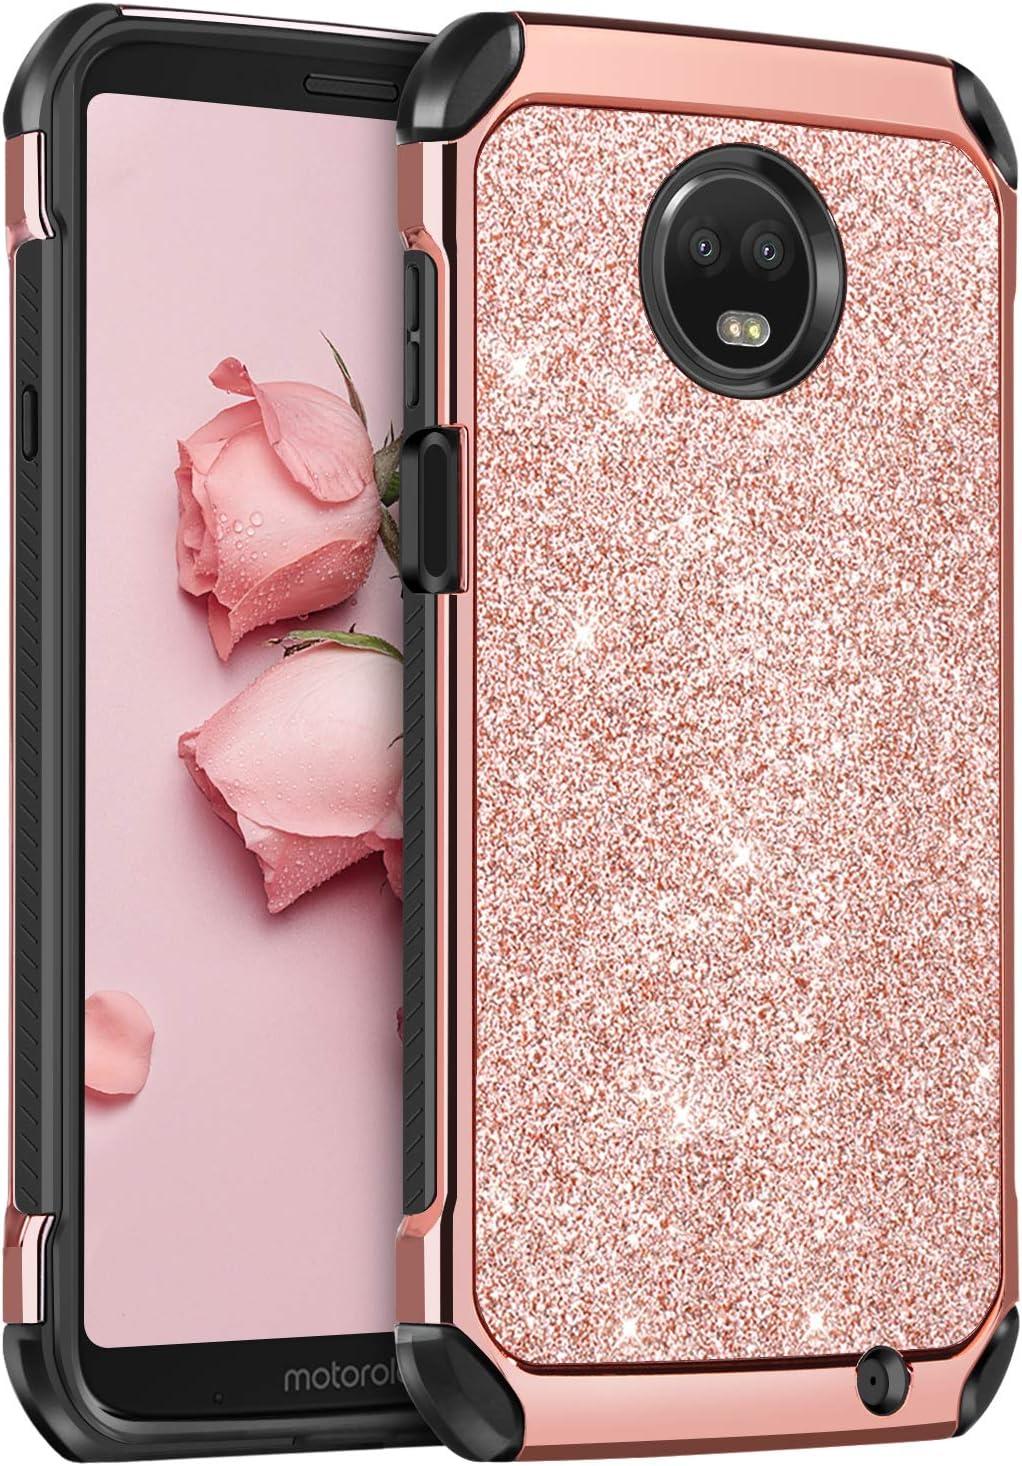 BENTOBEN Moto Z3 Case/Moto Z3 Play Case, Shockproof Glitter Sparkle Bling Girl Women 2 in 1 Shiny Faux Leather Hard Case Soft Bumper Protective Phone Cover for Motorola Moto Z3/Z3 Play 2018, Rose Gold